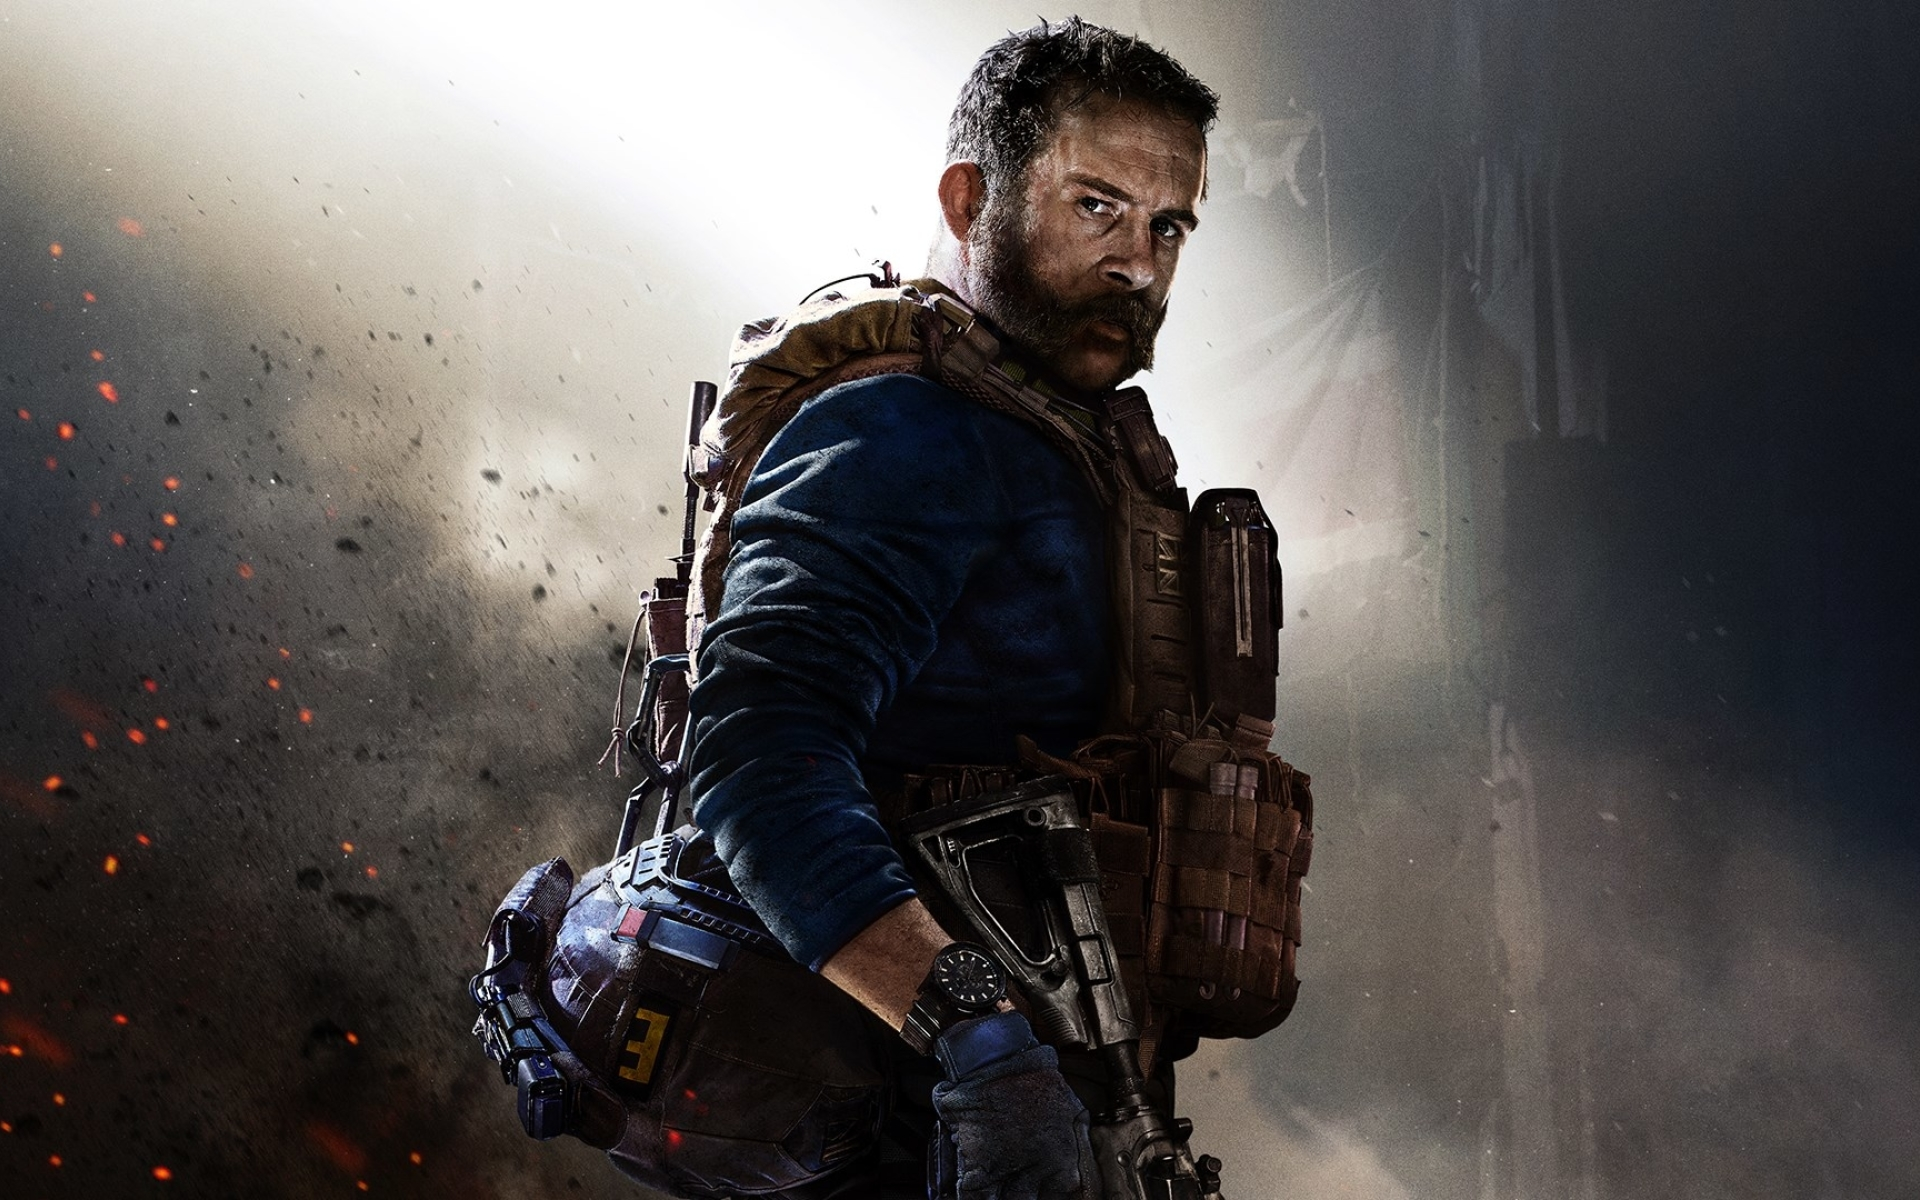 1920x1200 Call of Duty Modern Warfare Game Poster 1200P ...